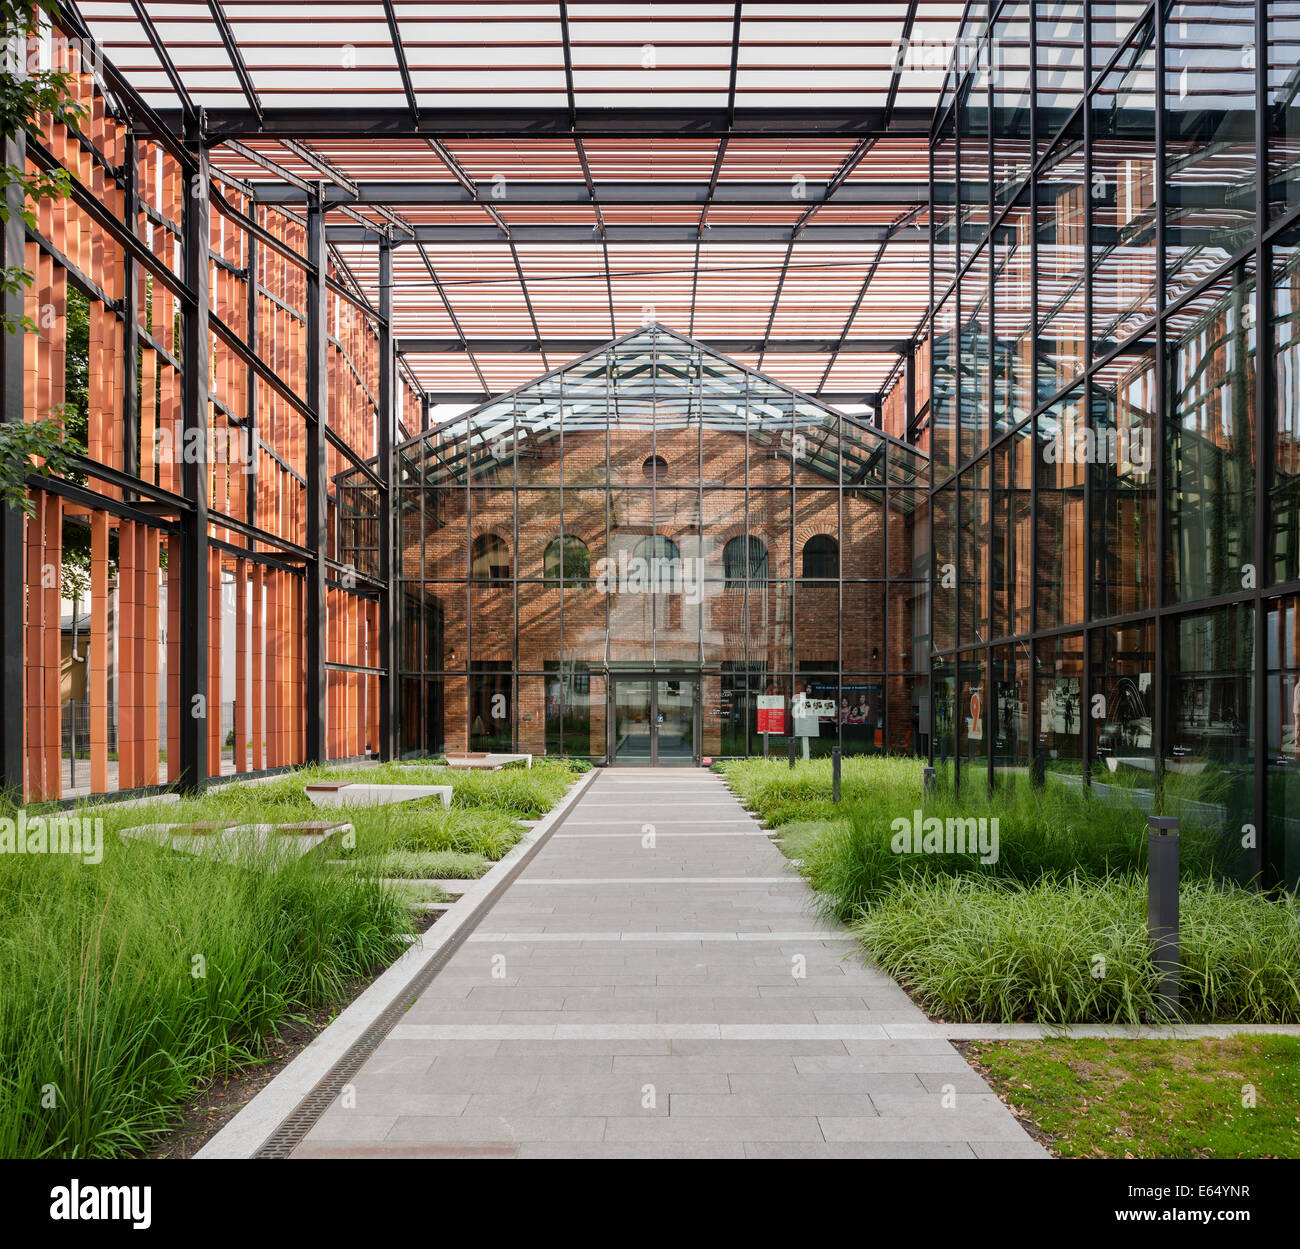 Garden Of Art: The Malopolska Garden Of Arts, Krakow, Poland. Architect